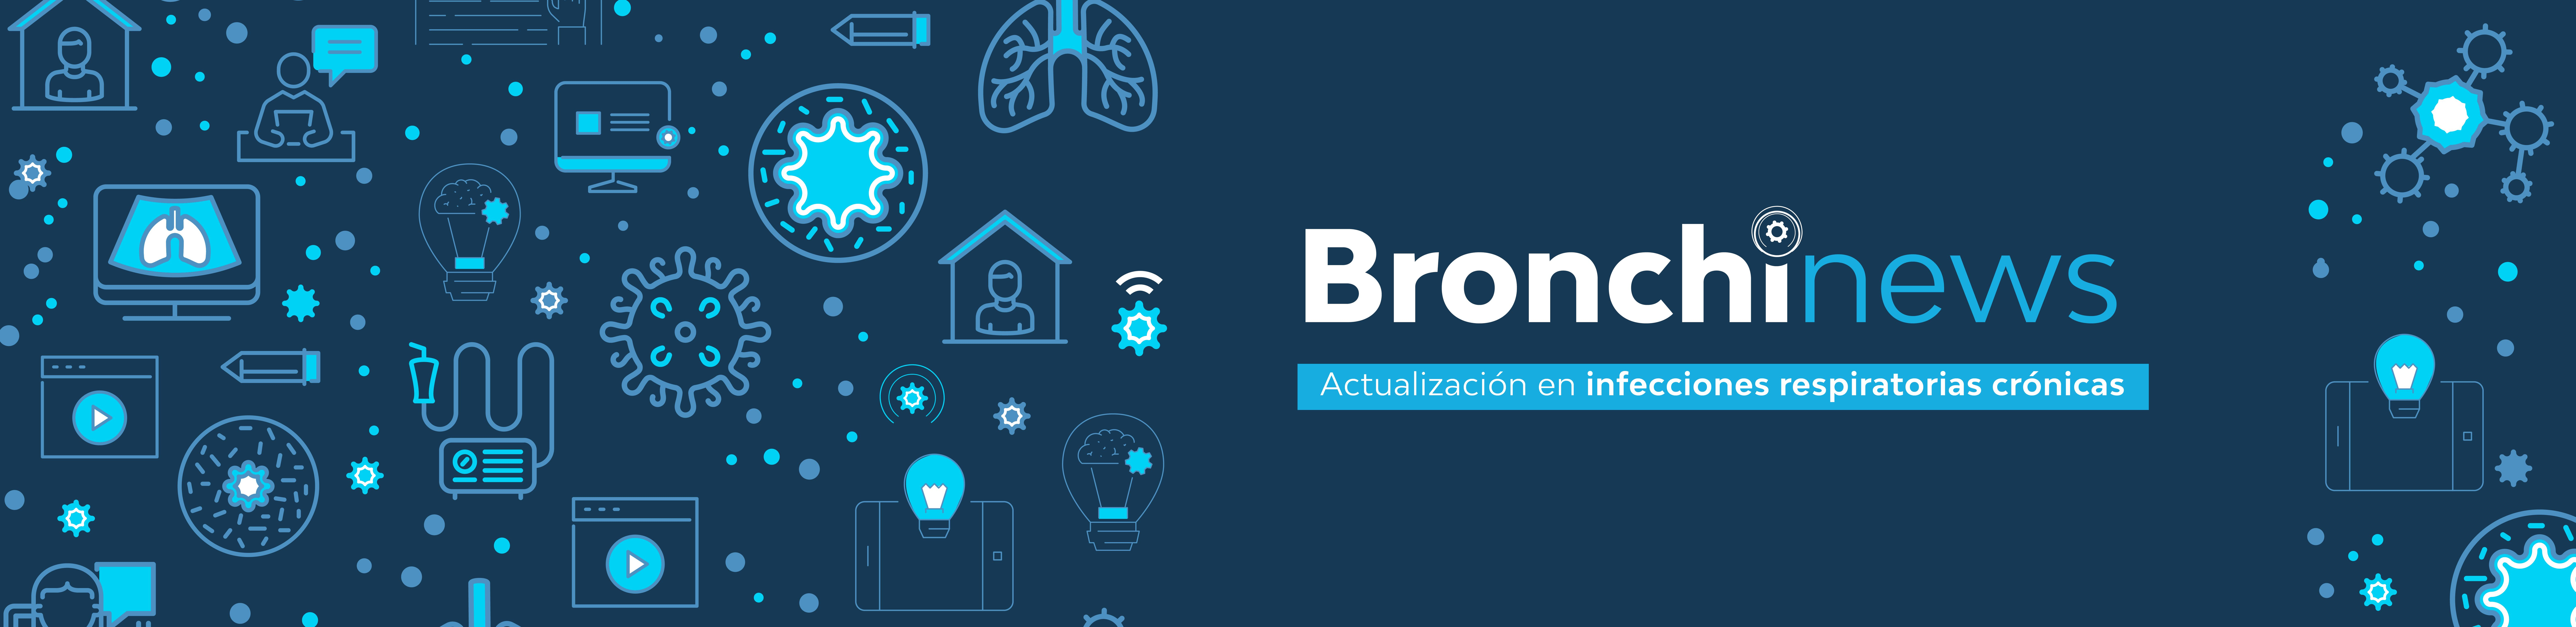 Bronchinews